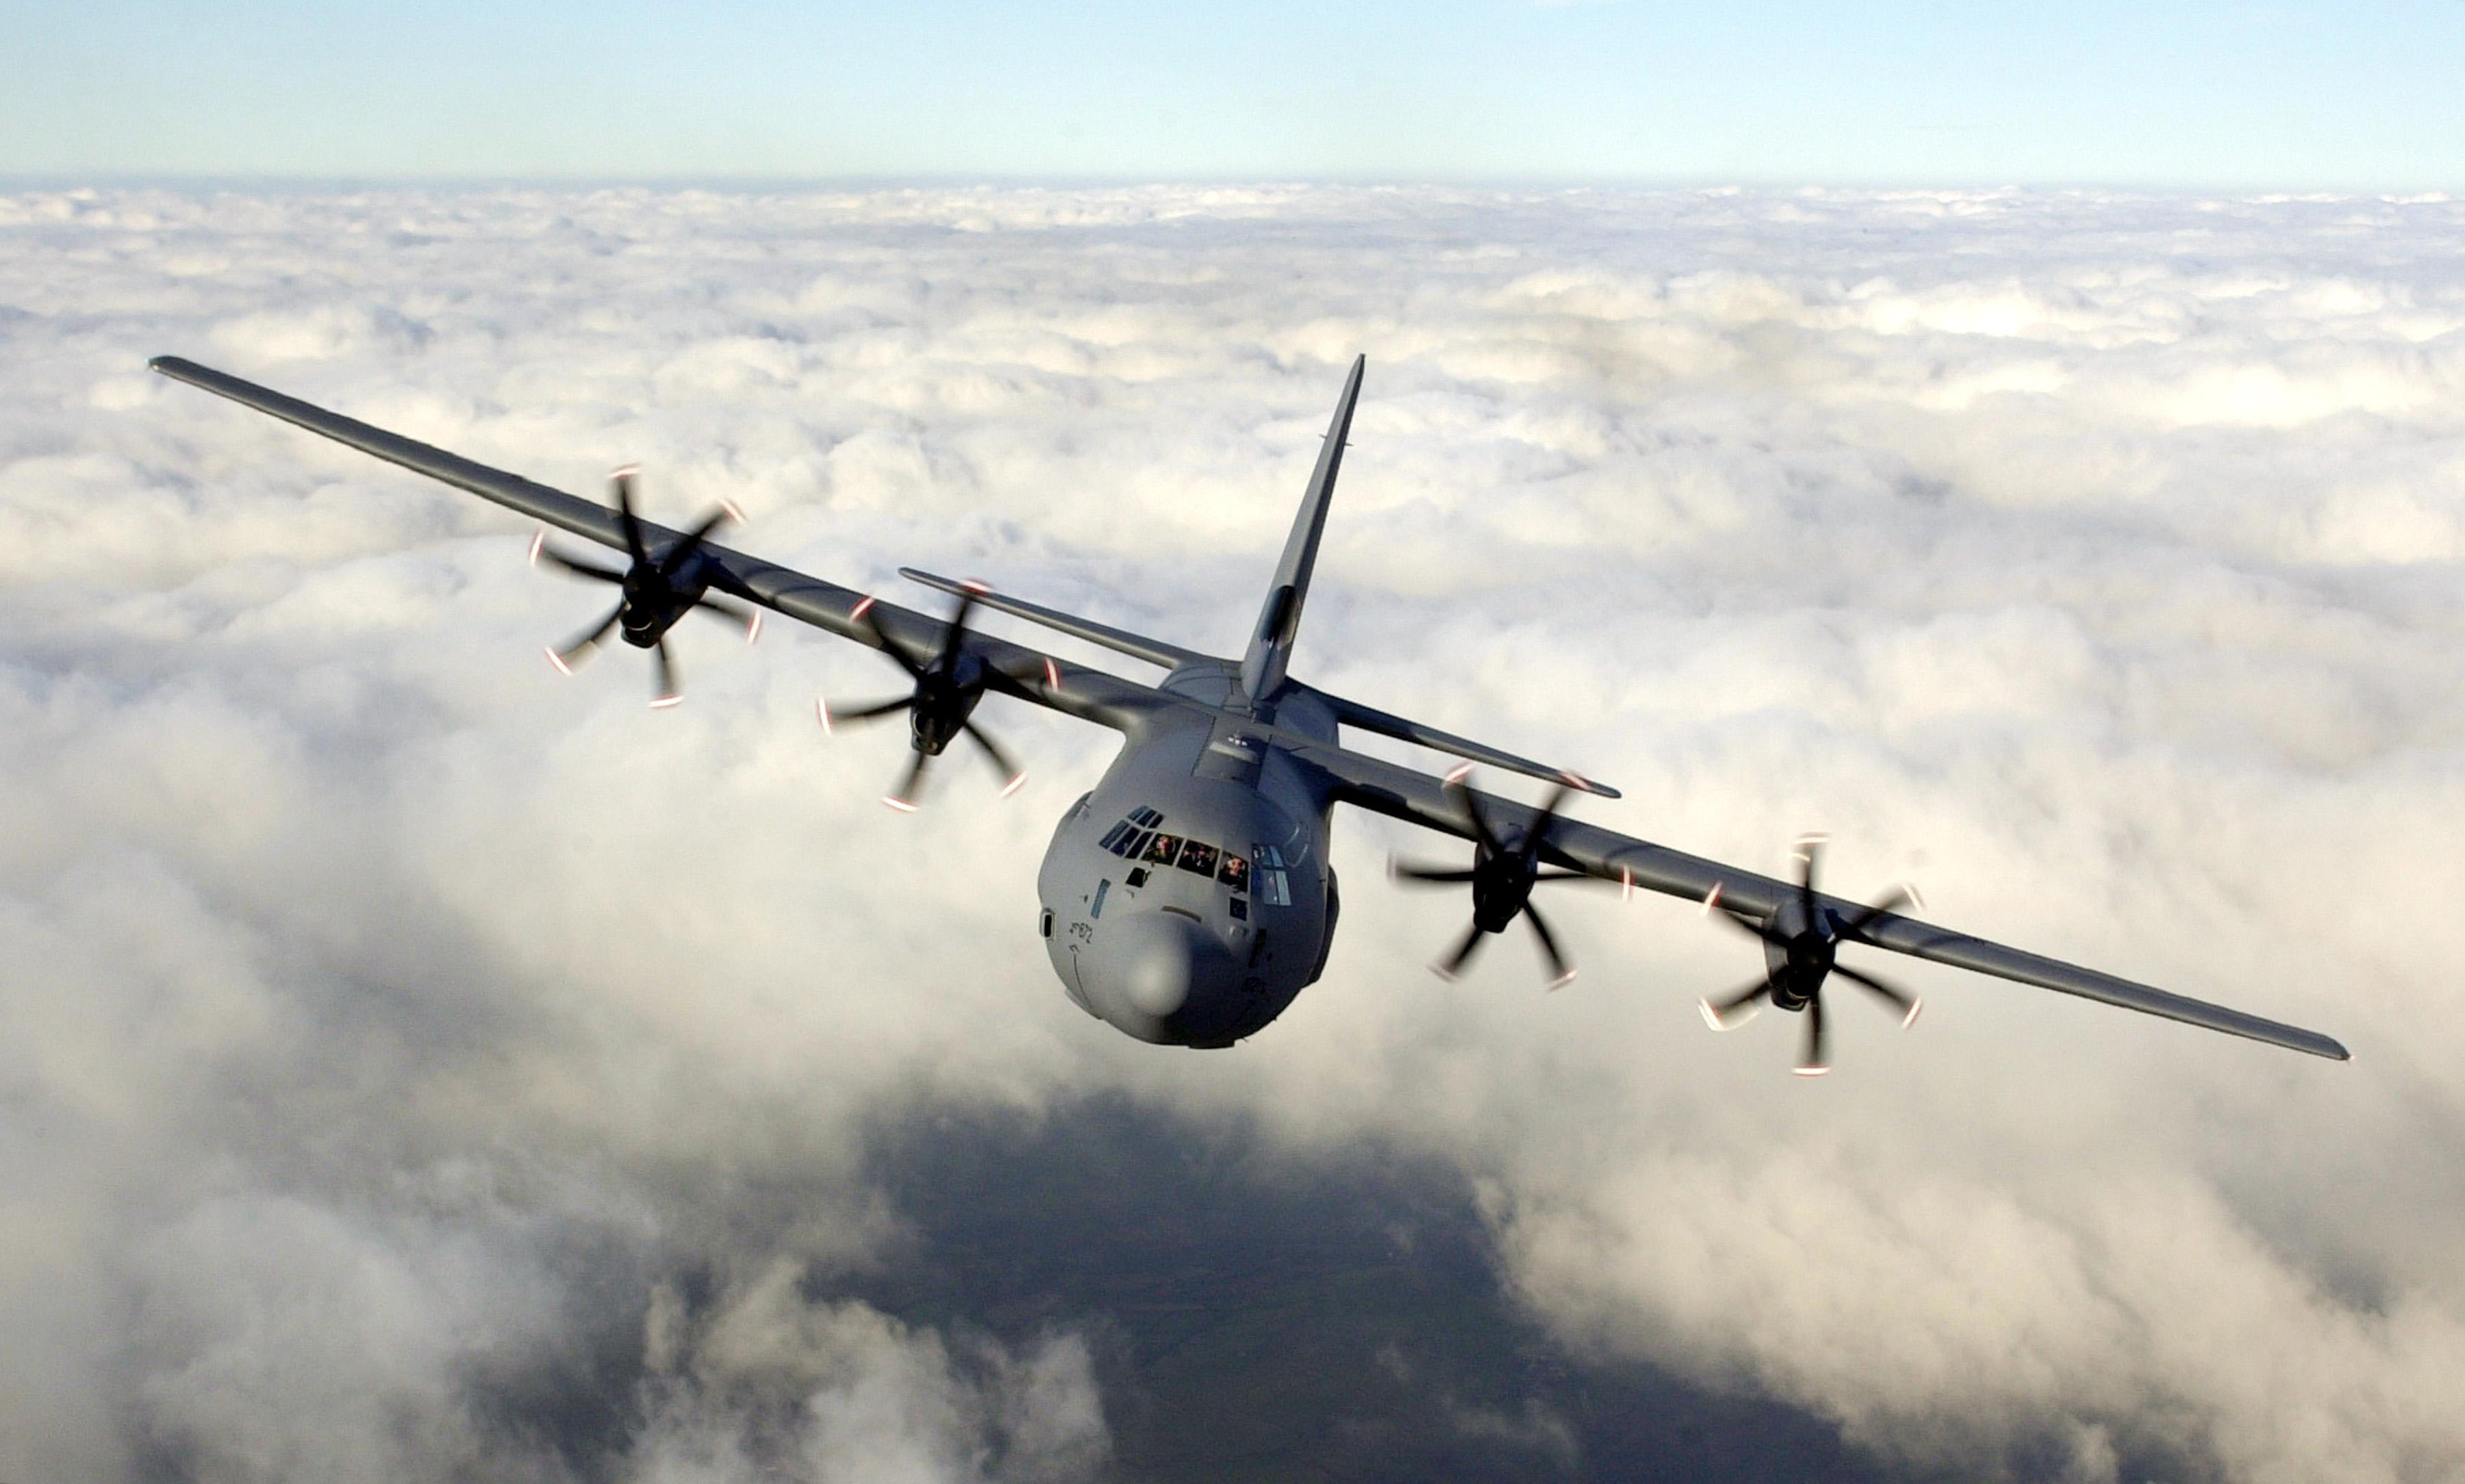 File:Hercules C130J MOD 45110507.jpg - Wikimedia Commons